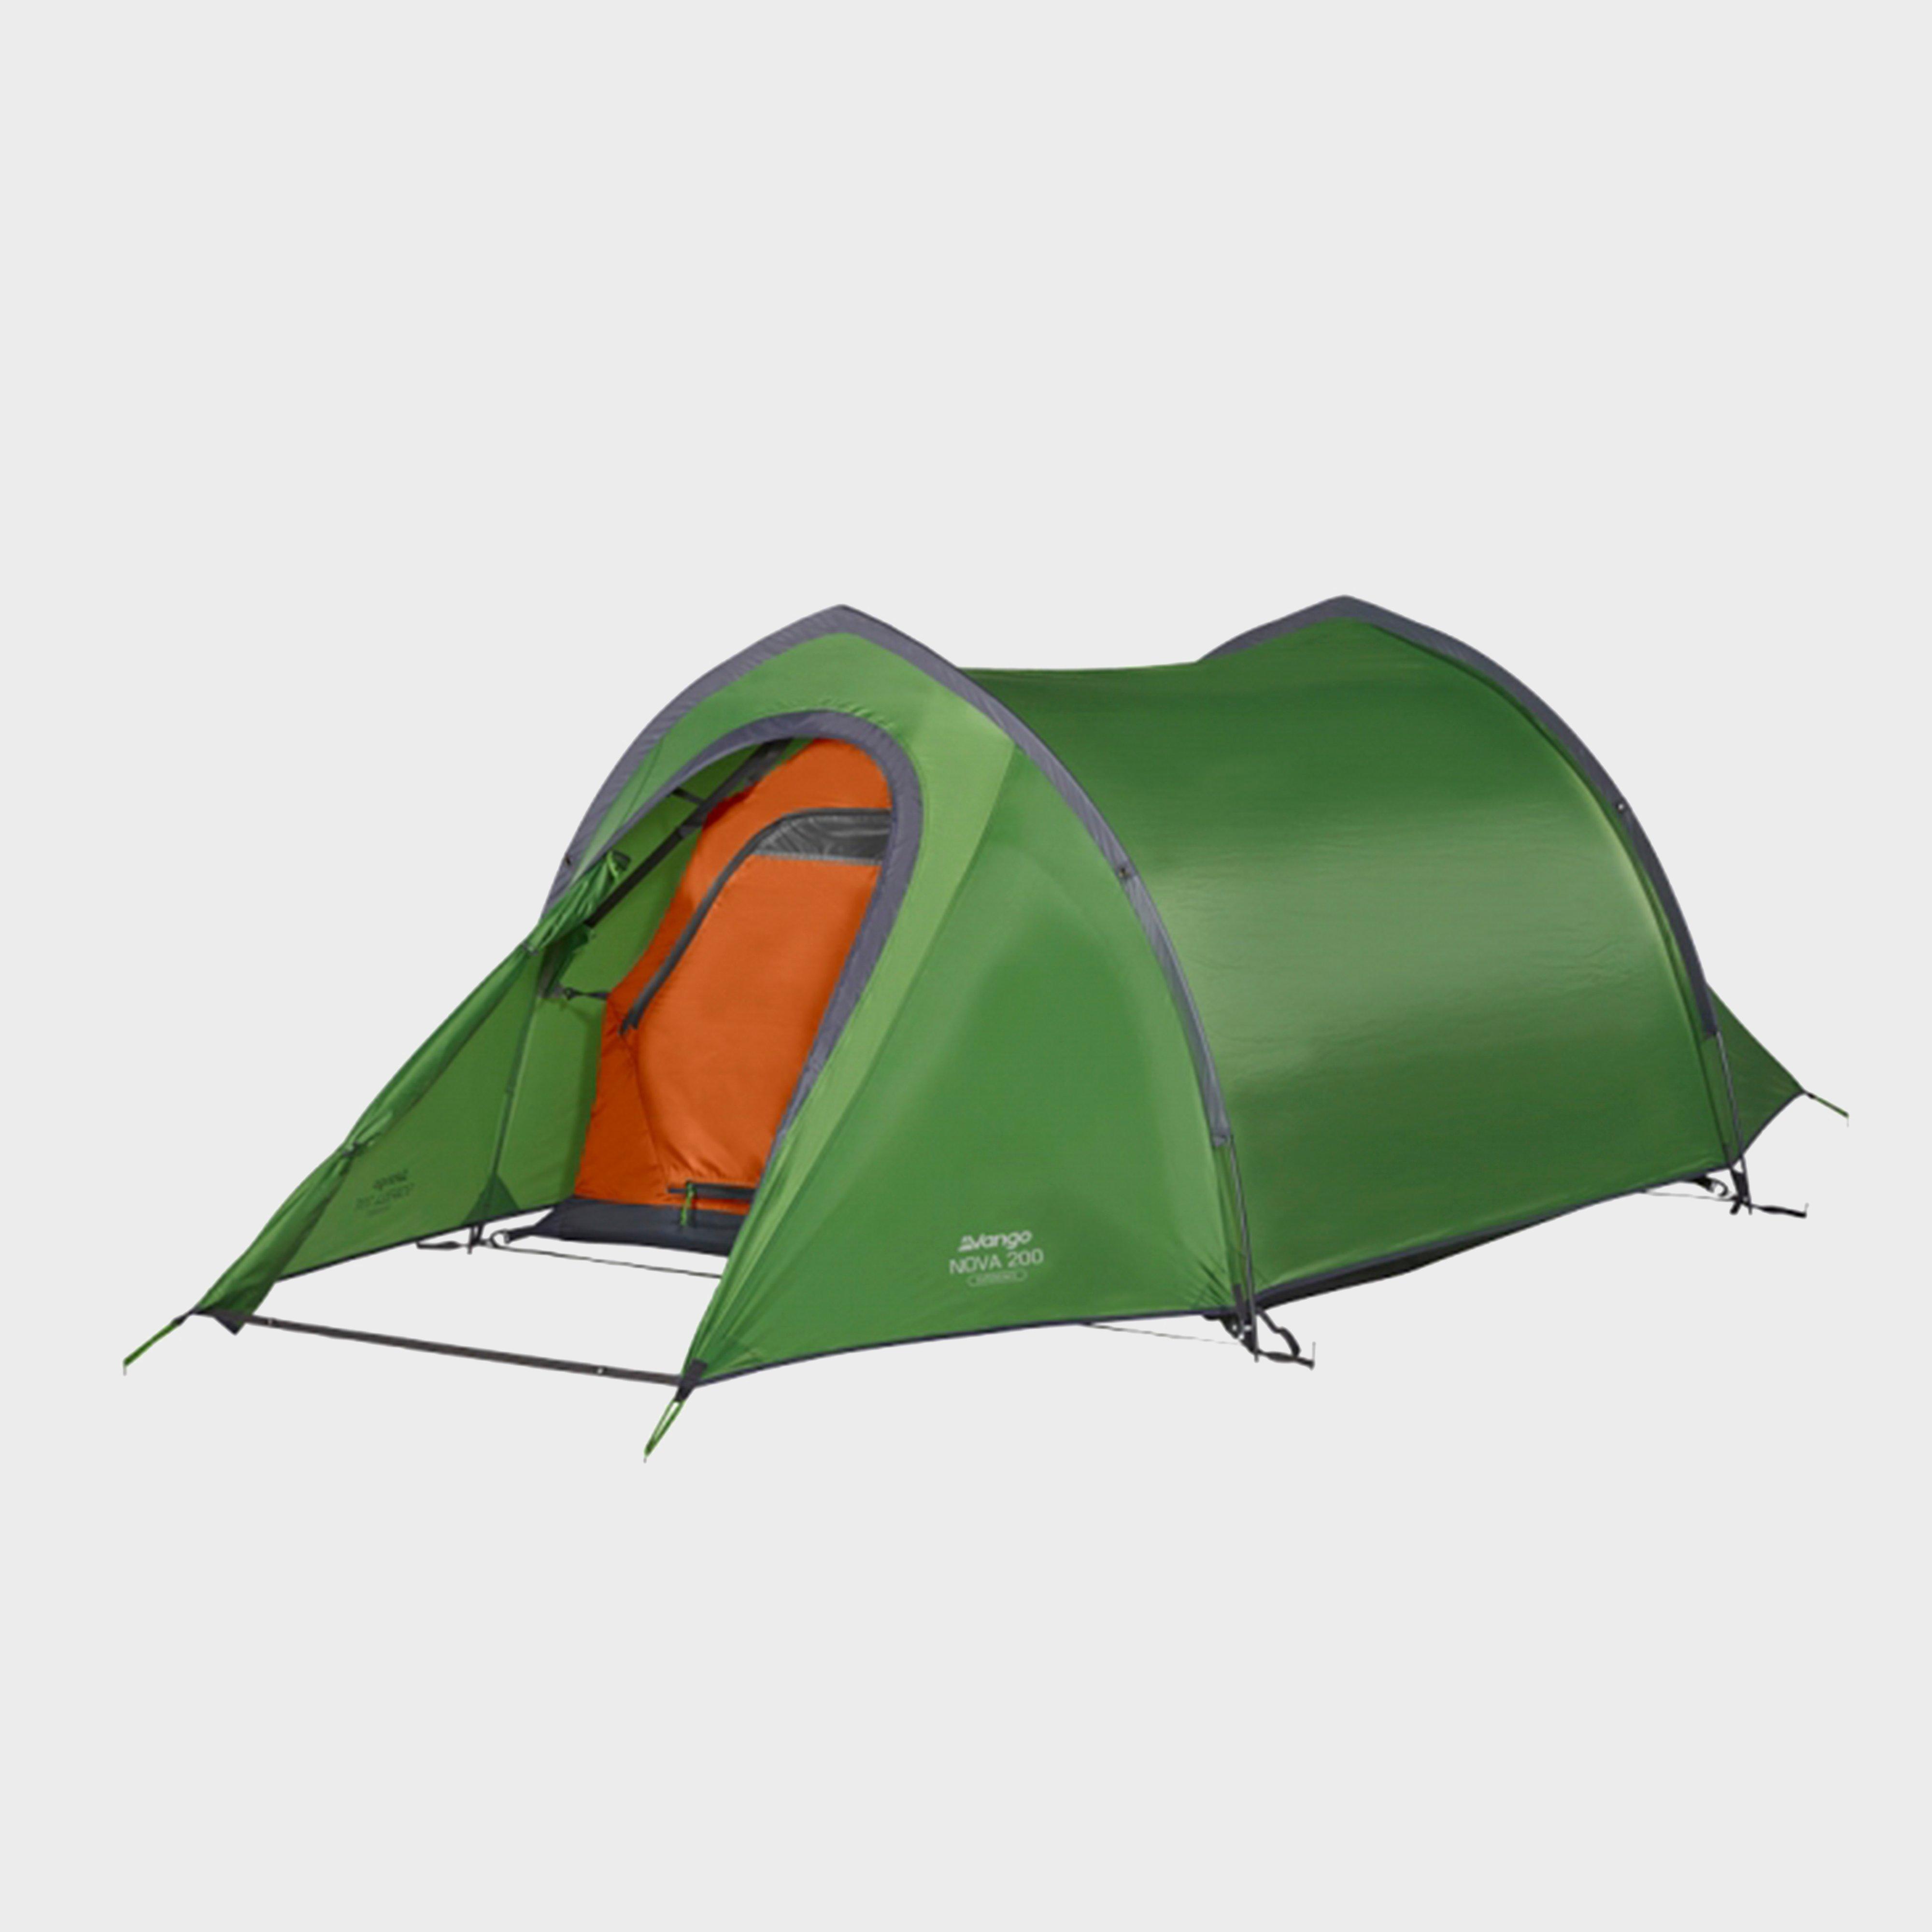 Vango Nova 200 Backpacking Tent (Green) - Green/200, Green/200